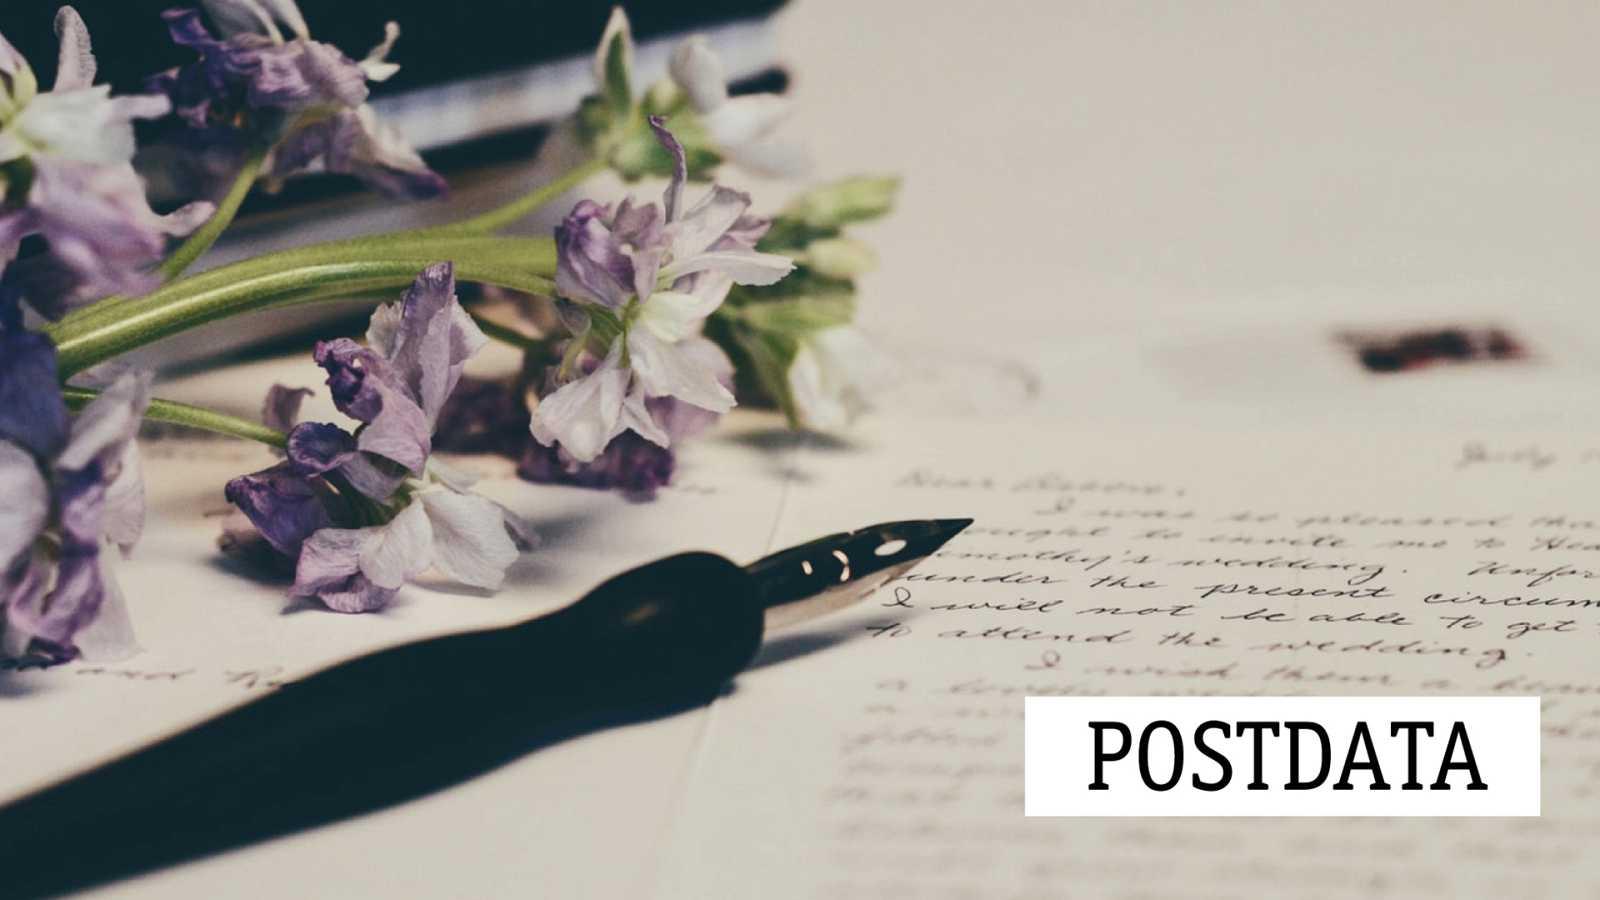 Postdata - Carta 160: La música clásica también es negra - 11/06/20 - escuchar ahora